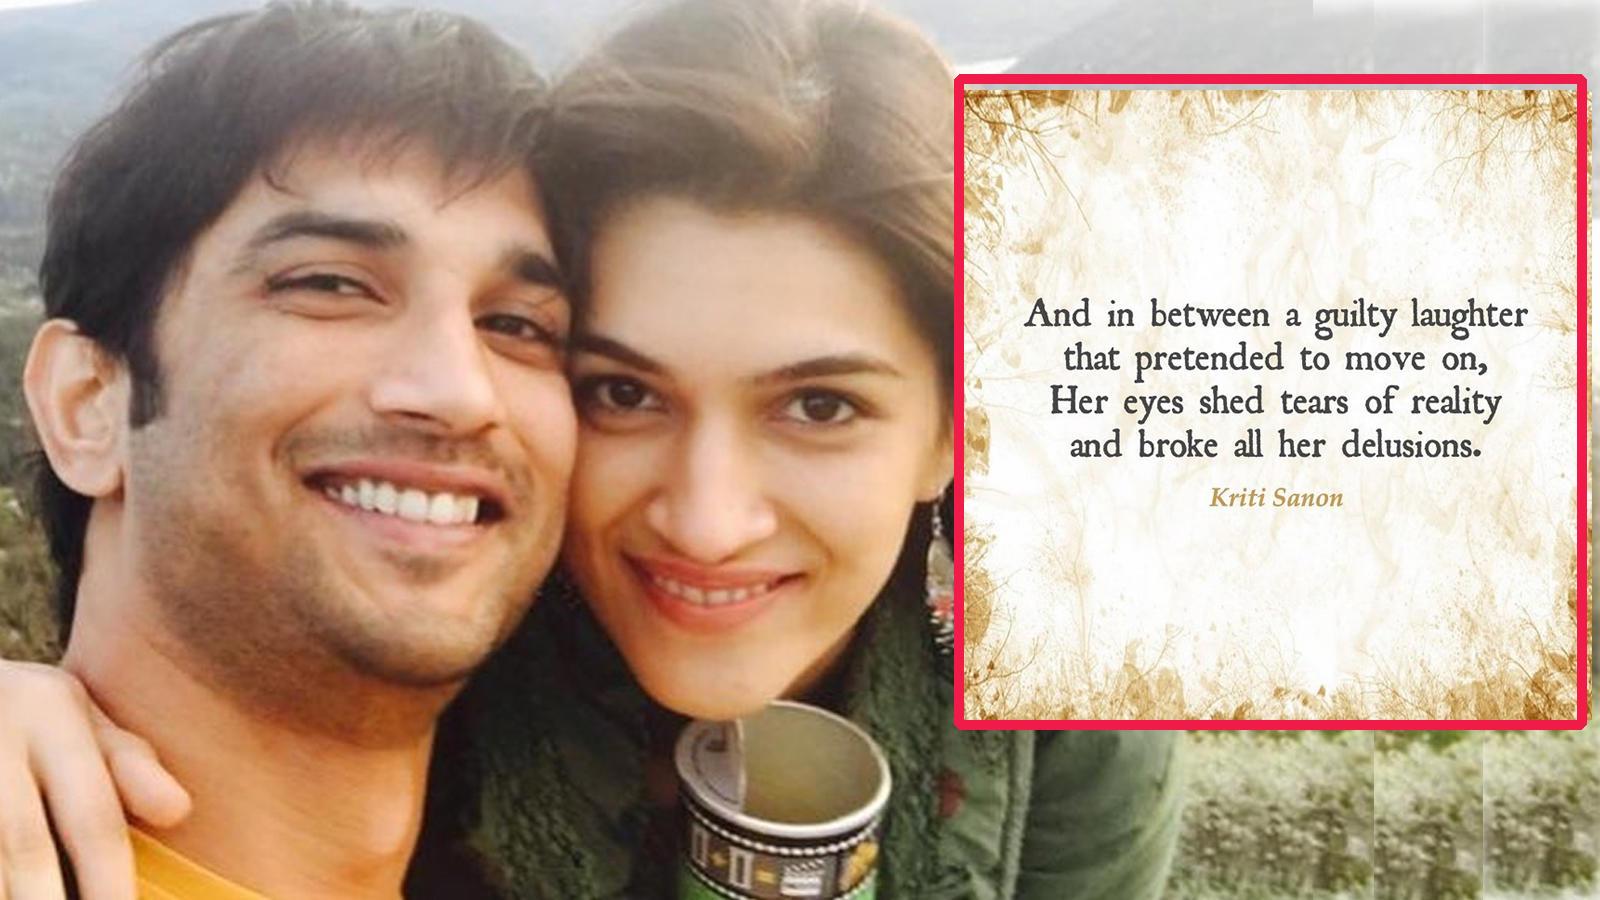 kriti-sanon-shares-cryptic-poem-fans-assume-she-misses-sushant-singh-rajput-terribly